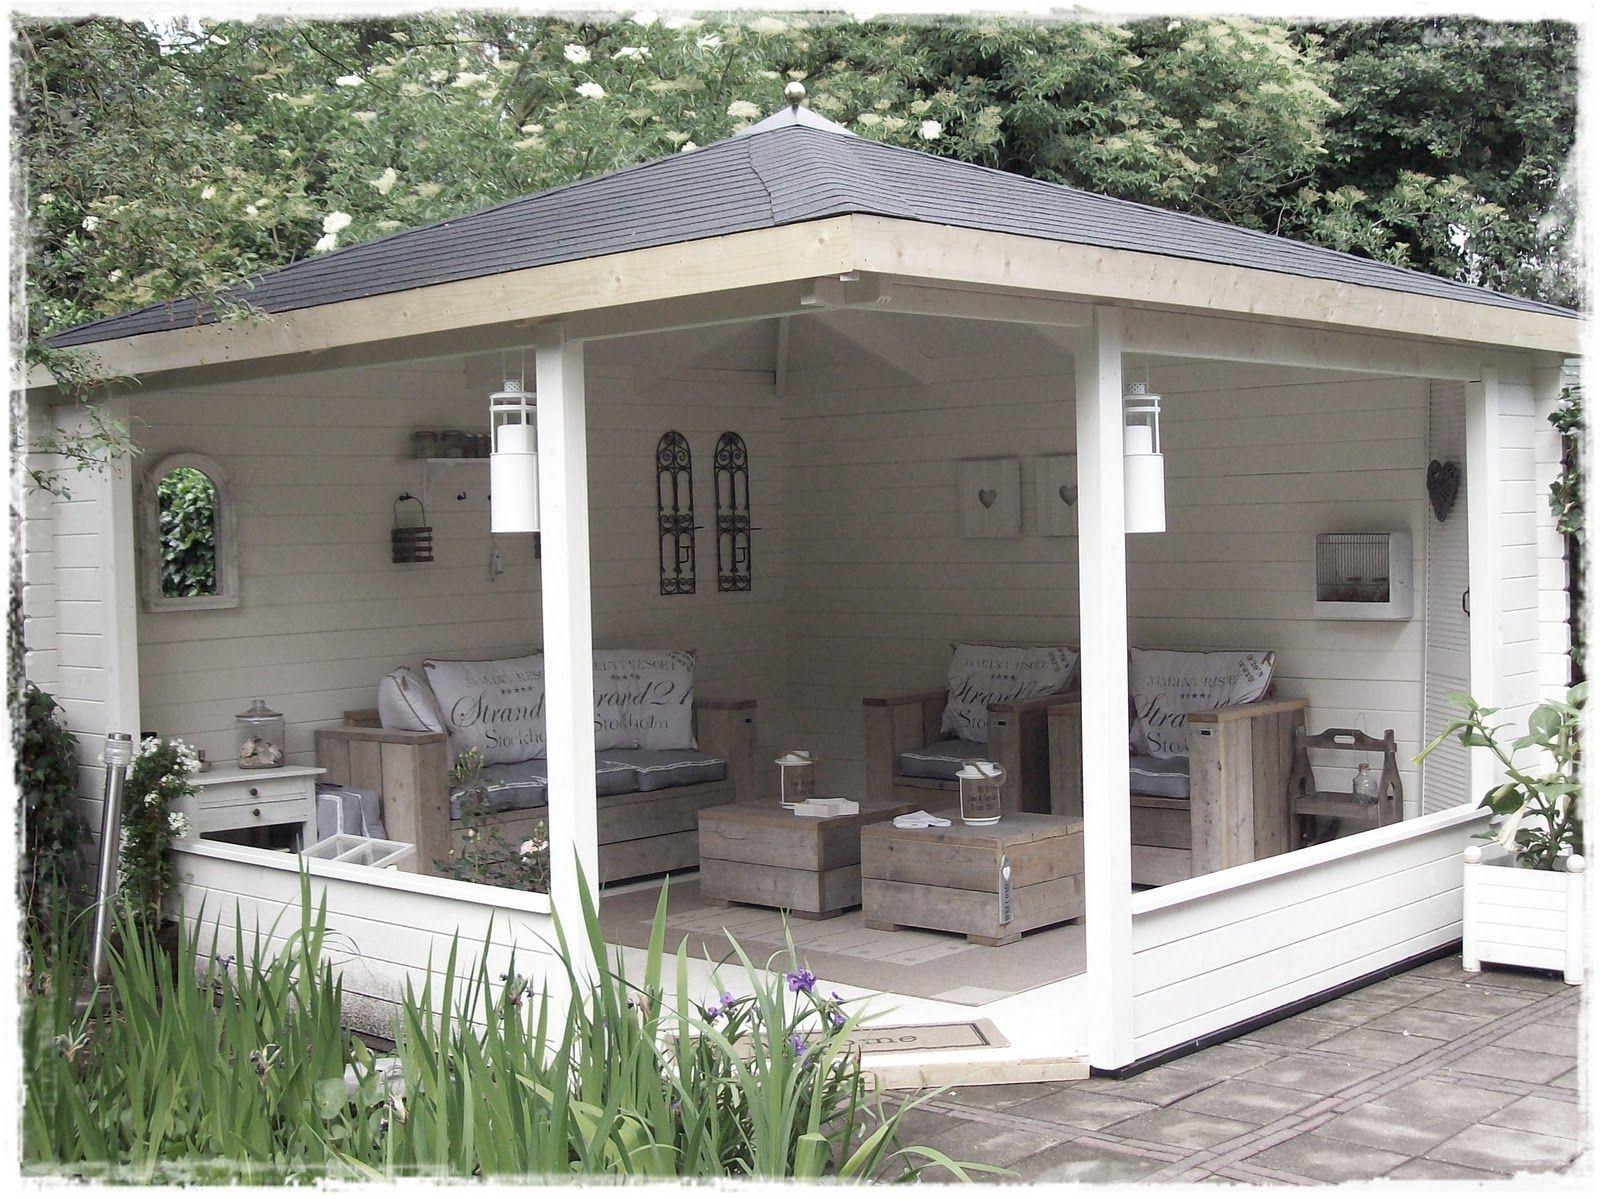 pin by zulma hijazi on patios | pinterest | garden, patio and backyard